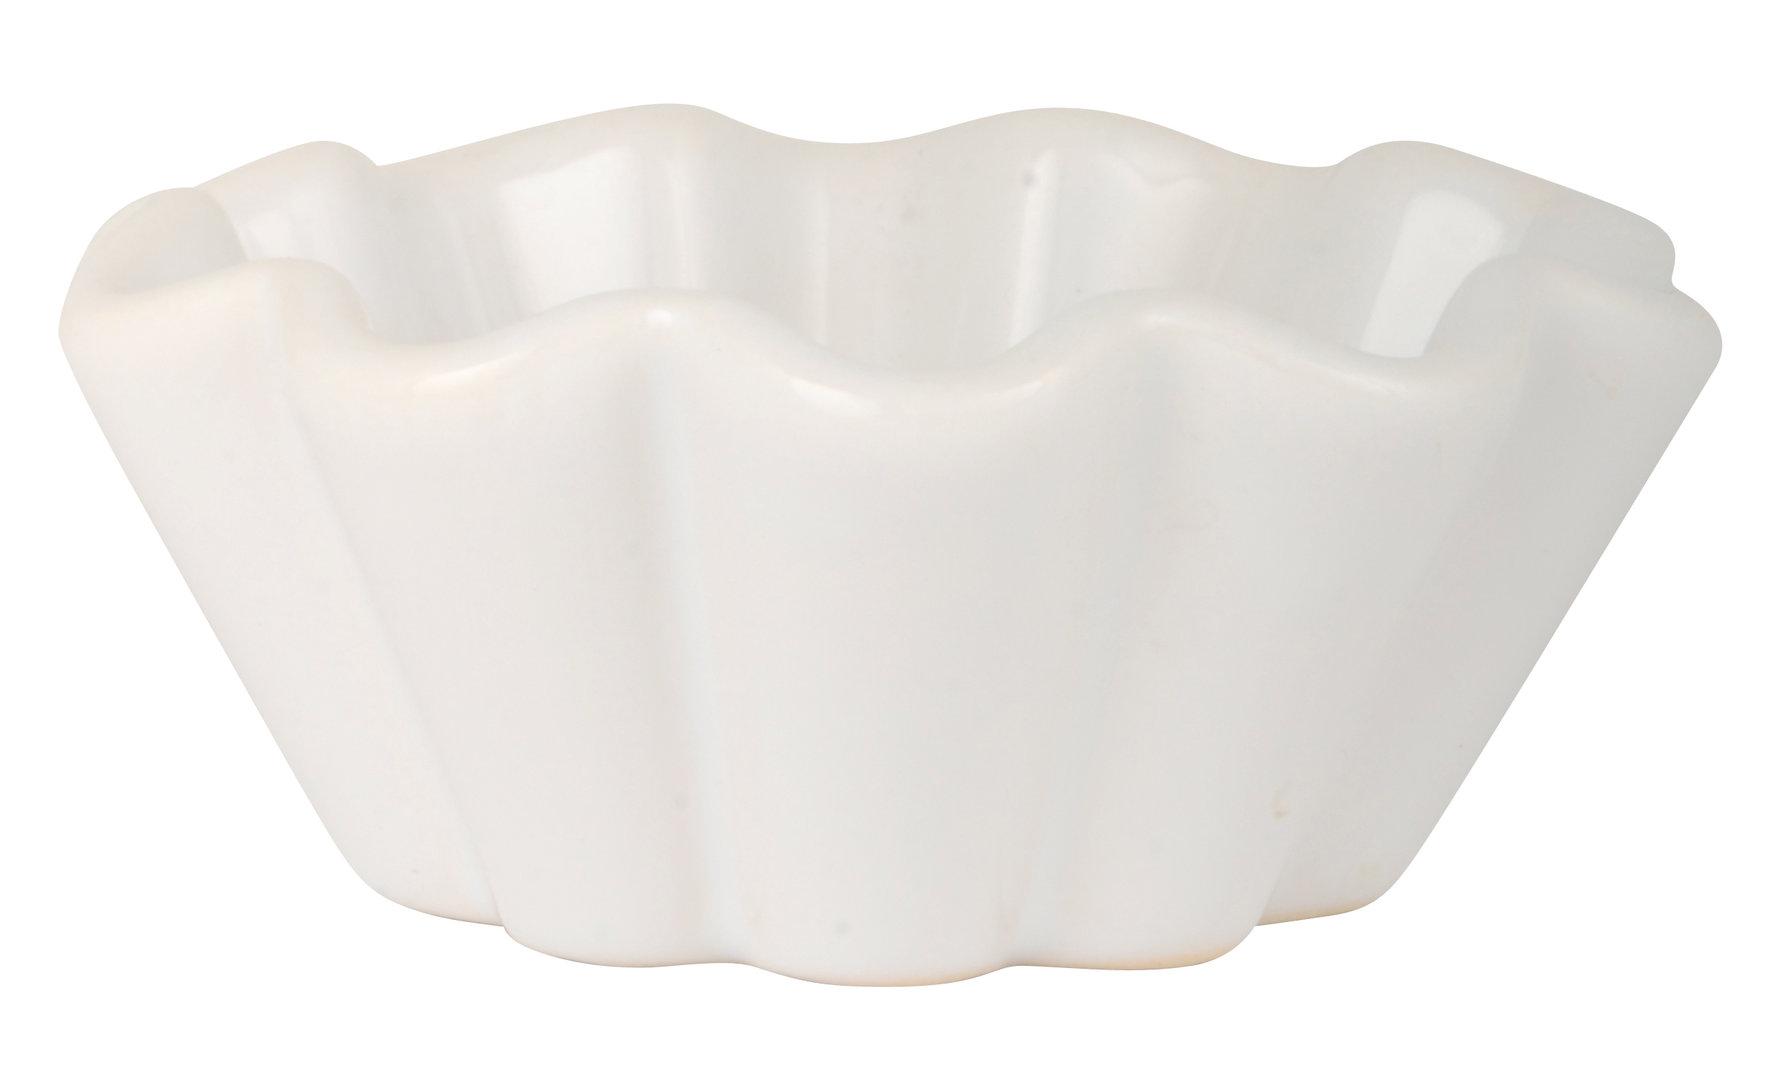 IB Laursen Muffinschale Mynte Pure White